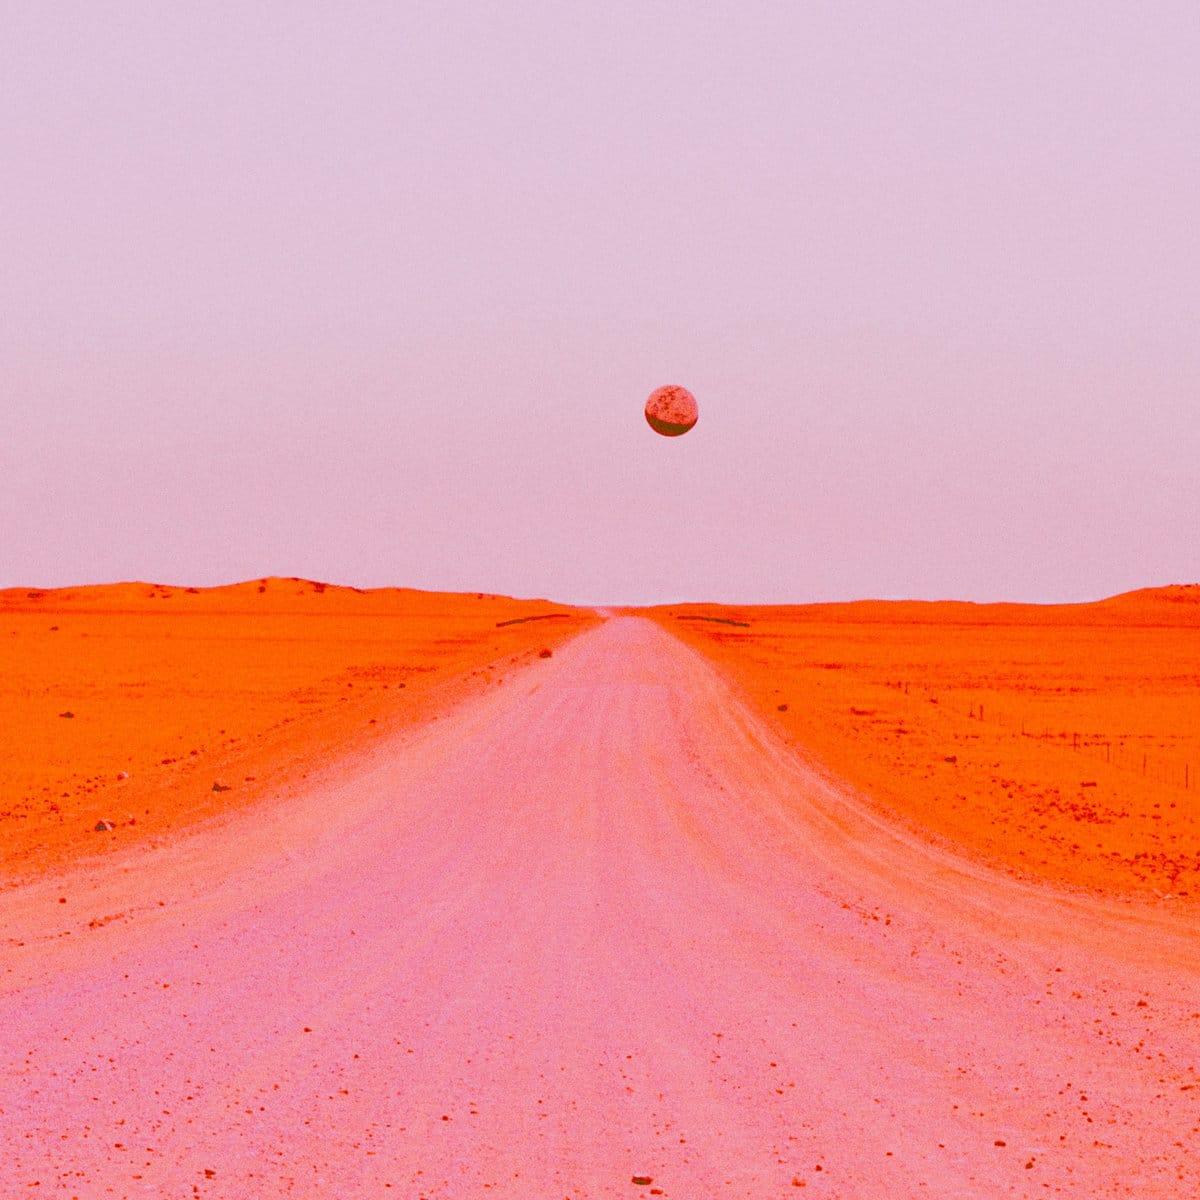 Saharas-Greenery-x-Nothingisreal